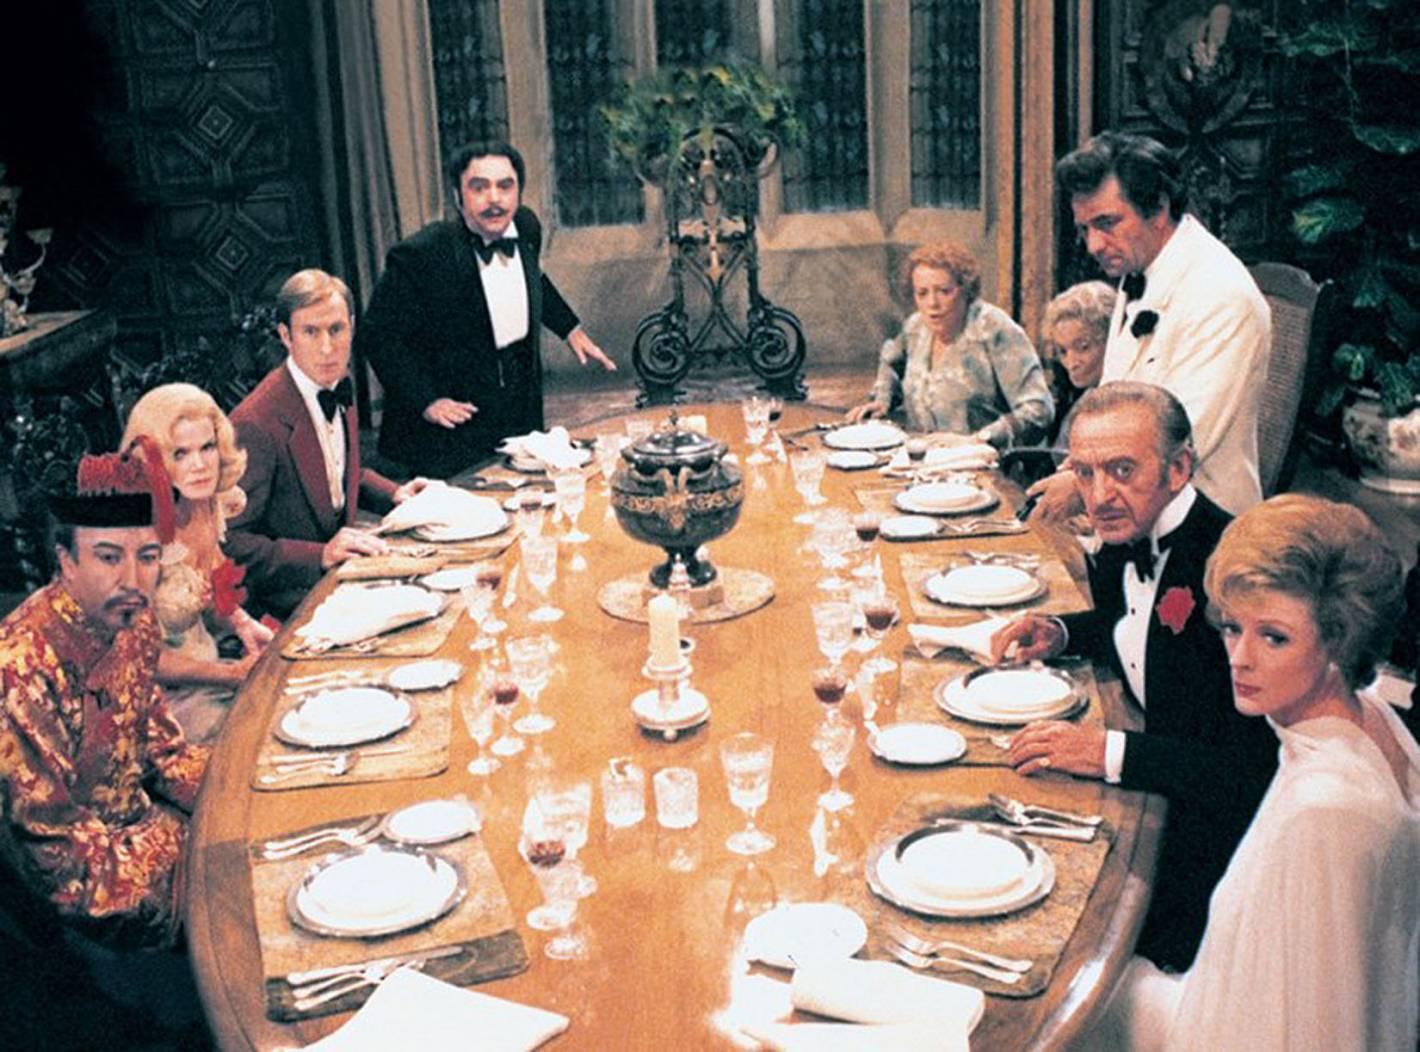 Halloween con cena con delitto in Piemonte